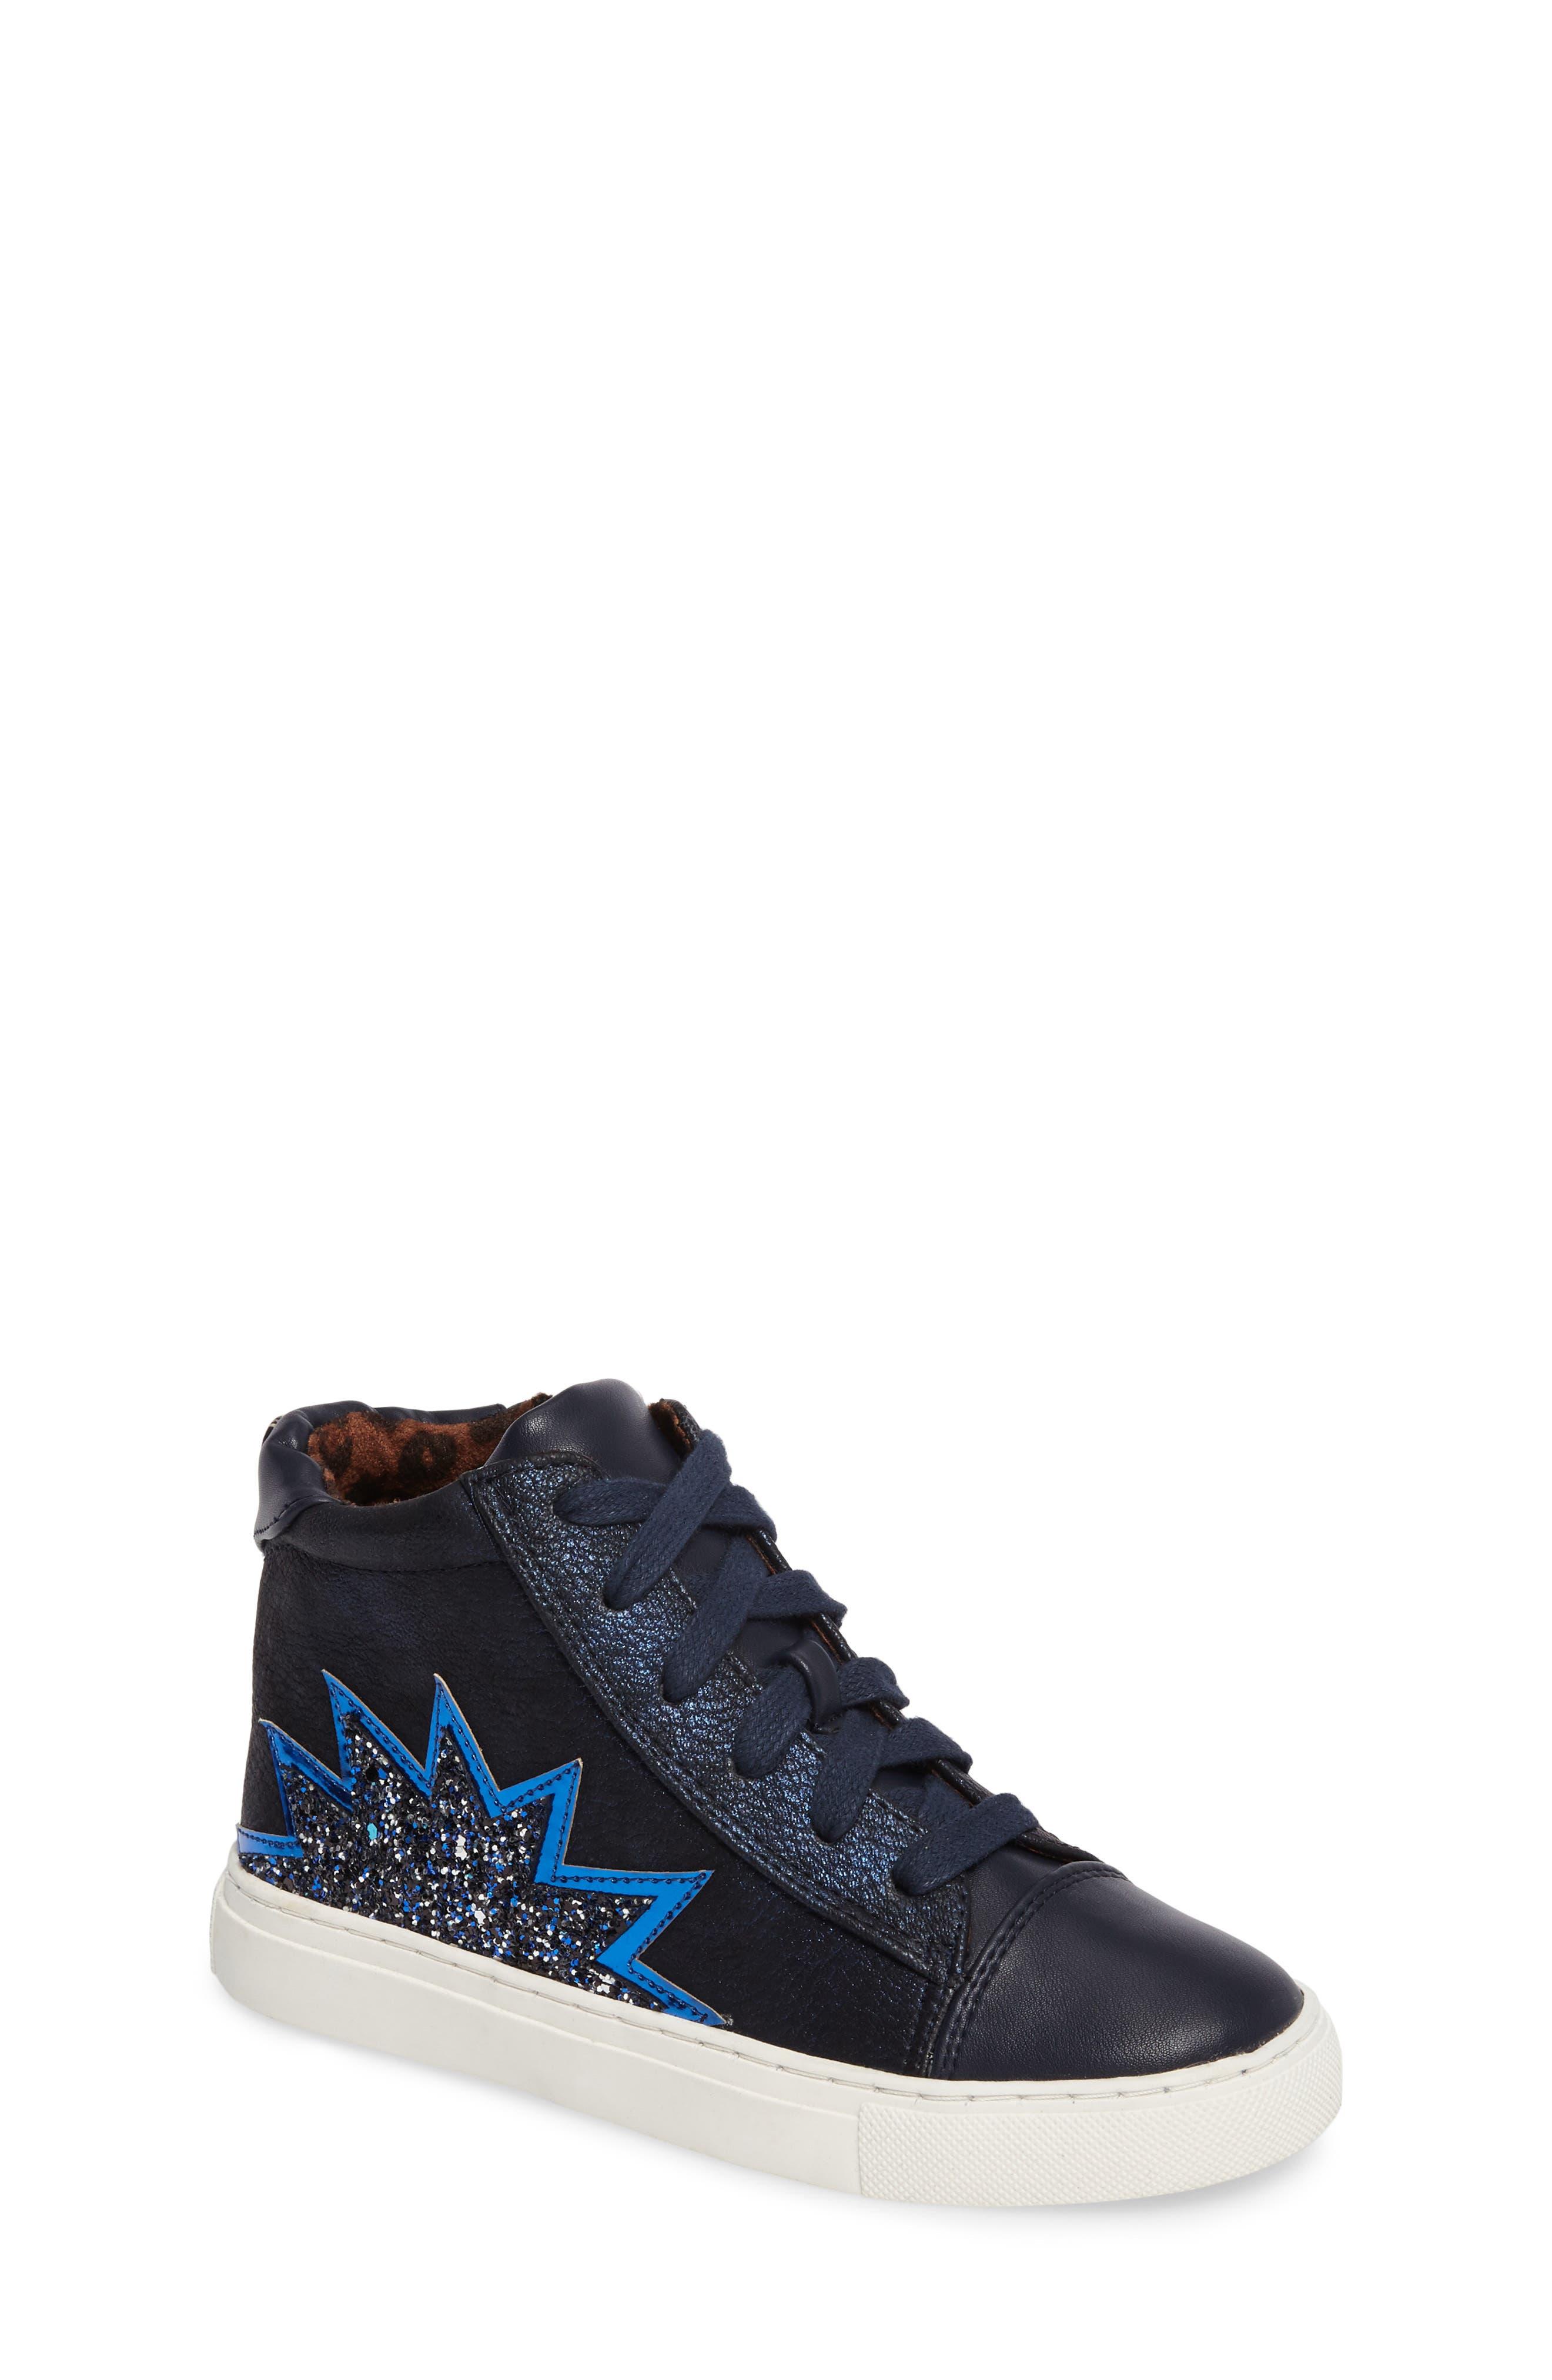 Jflash Glitter Star High Top Sneaker,                         Main,                         color,